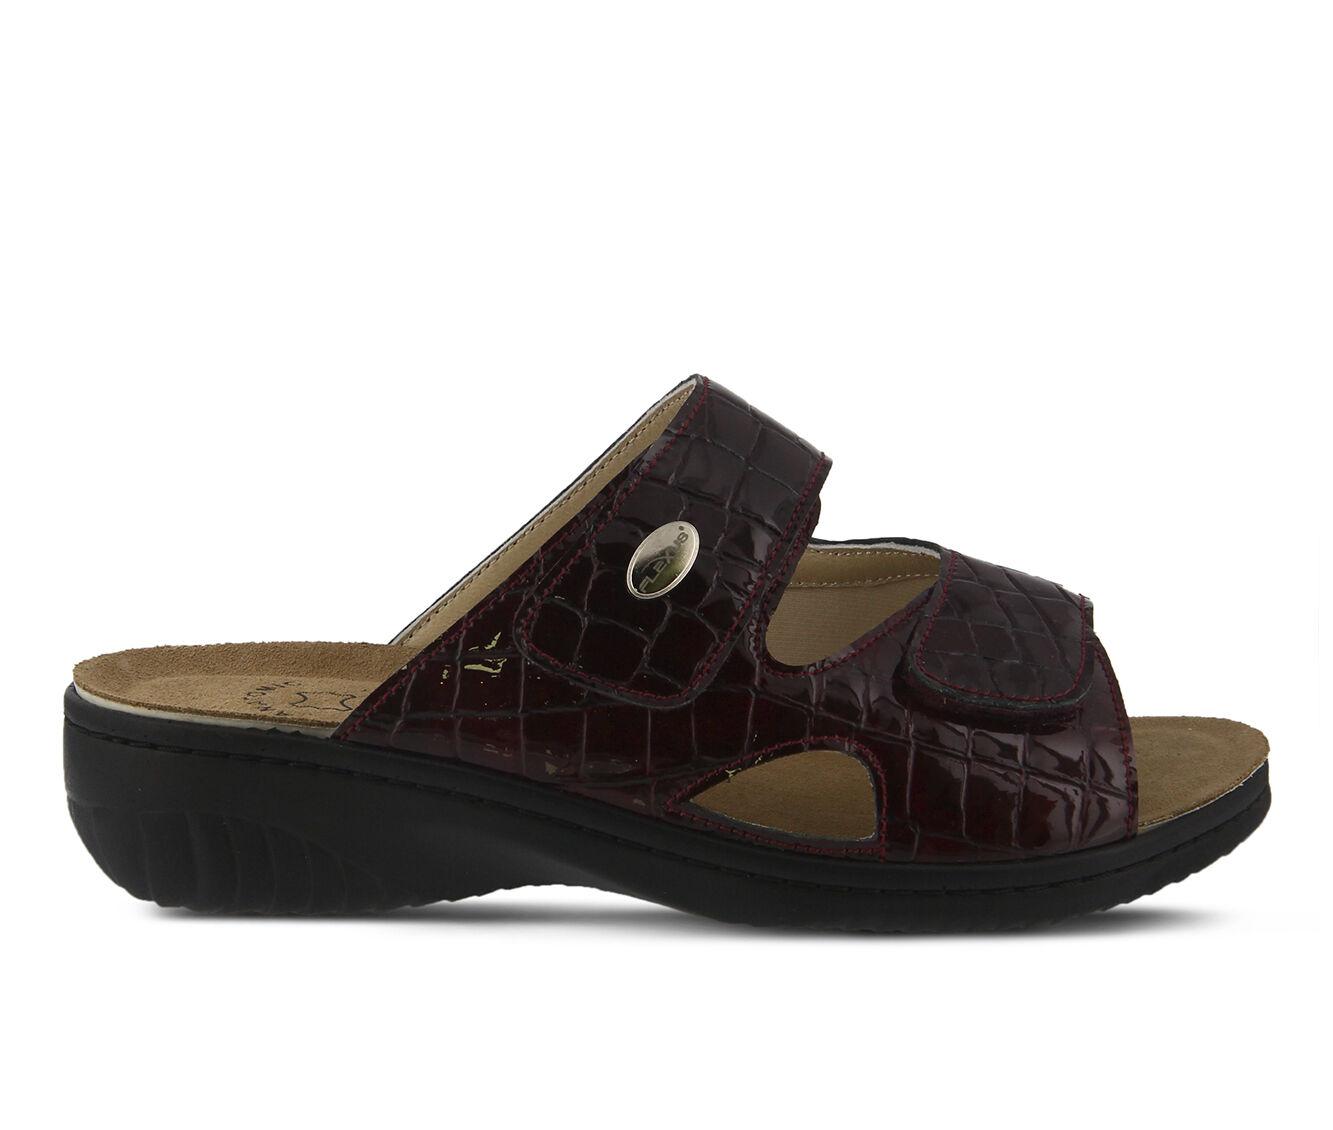 uk shoes_kd6673